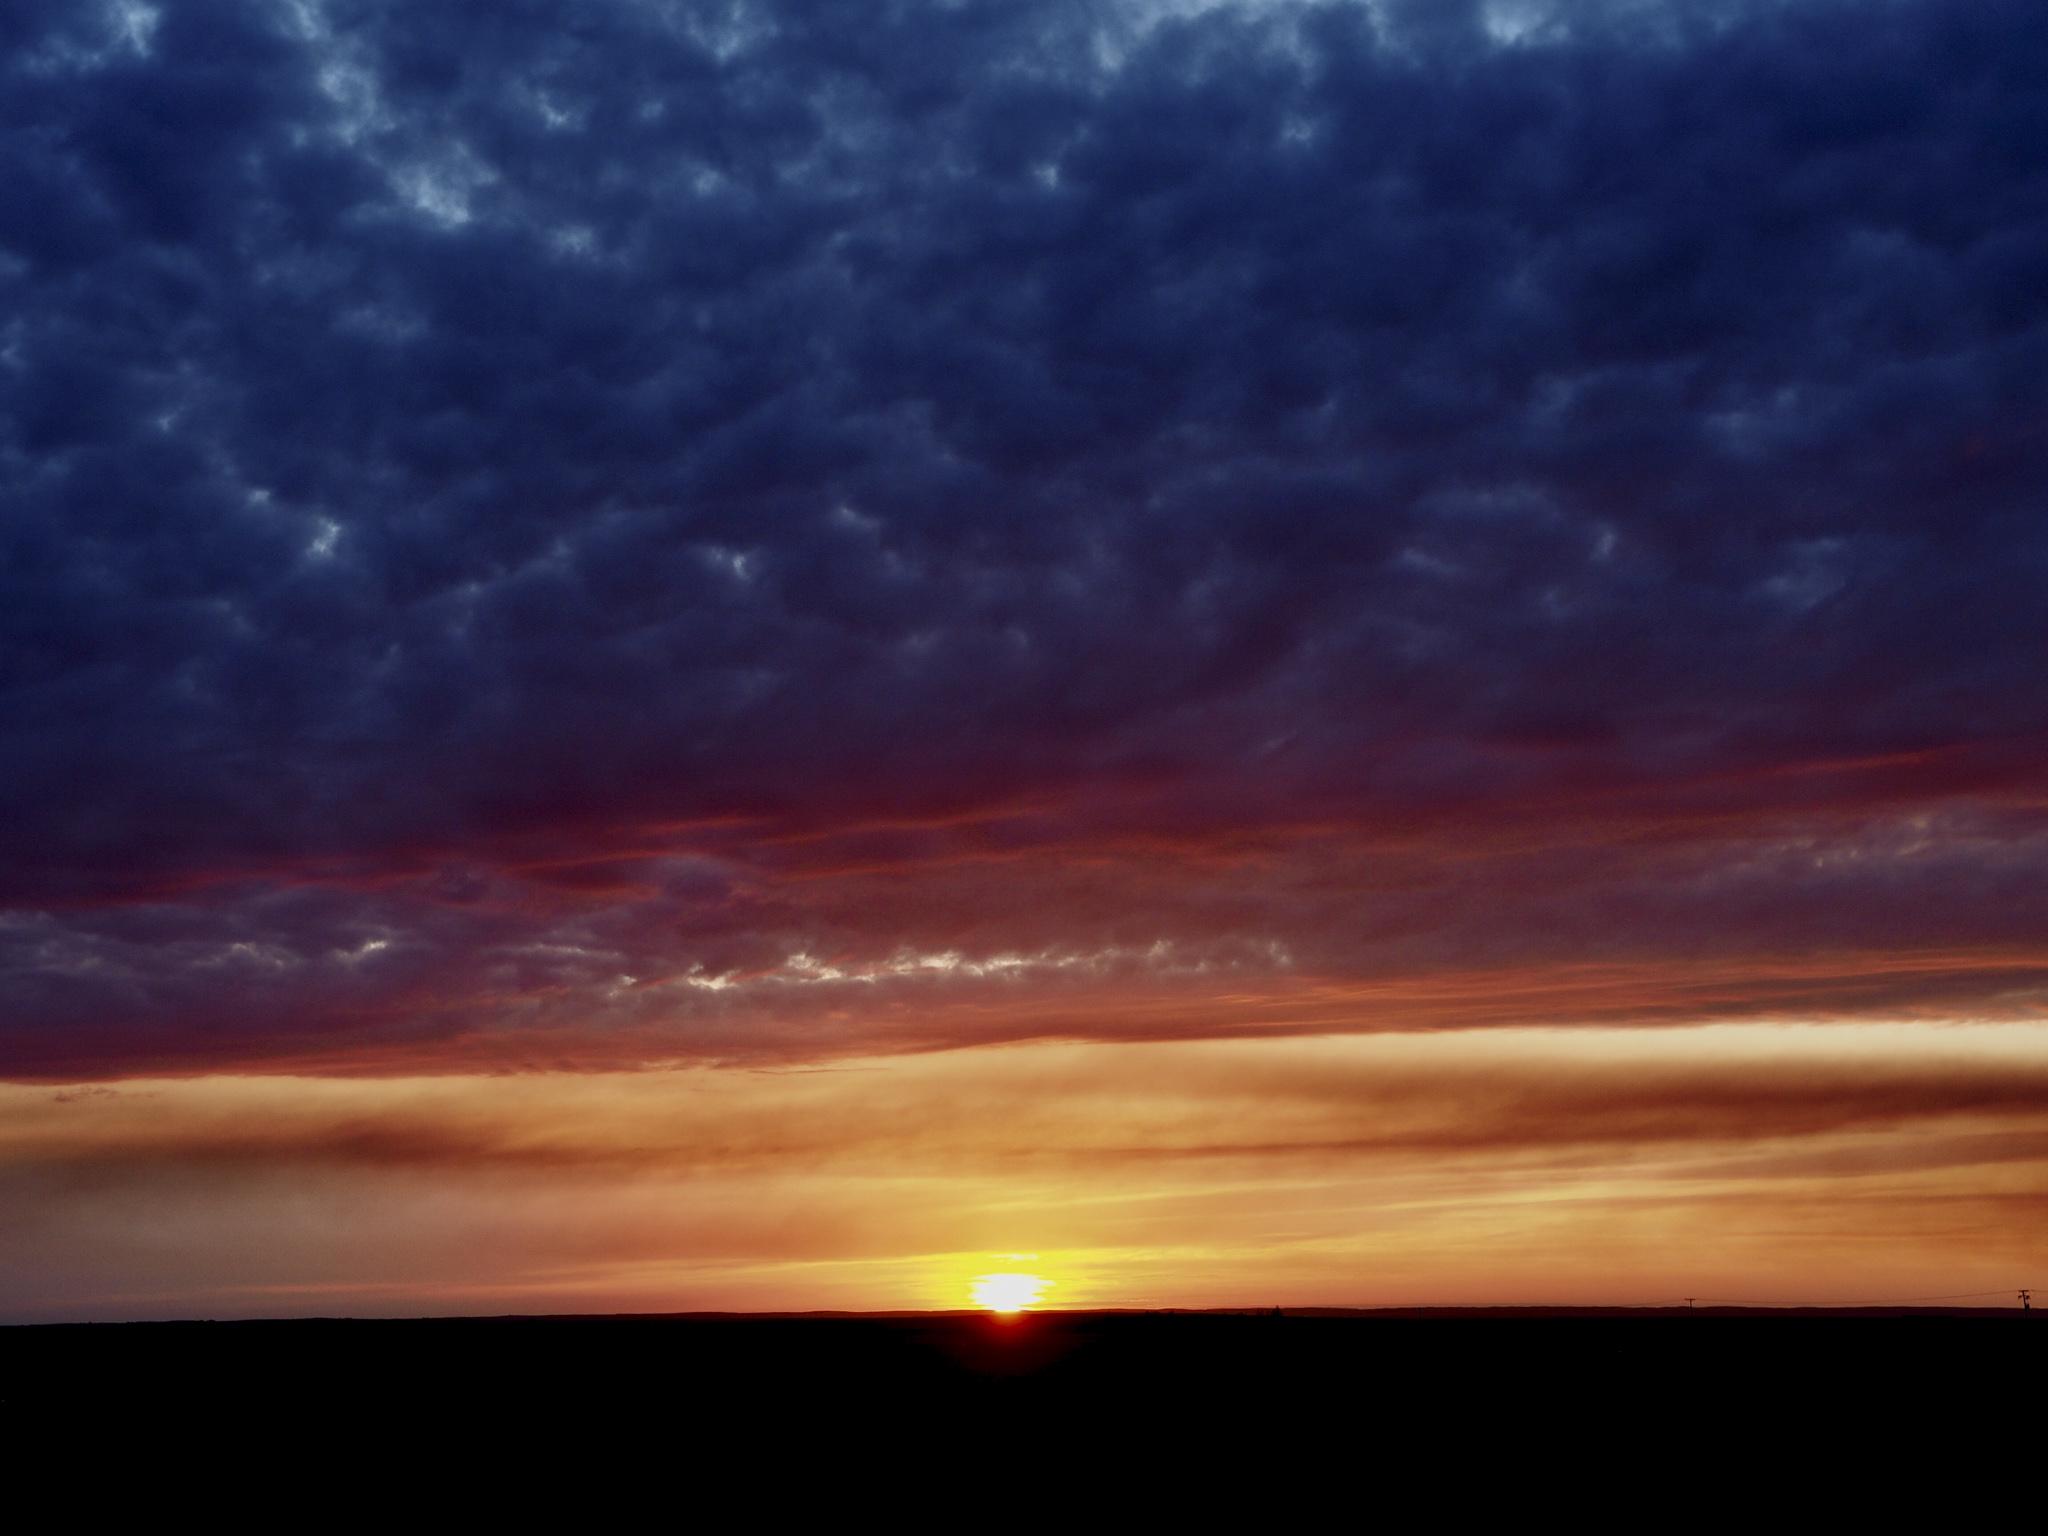 Saskatchewan Sunset - Kevin Haggkvist